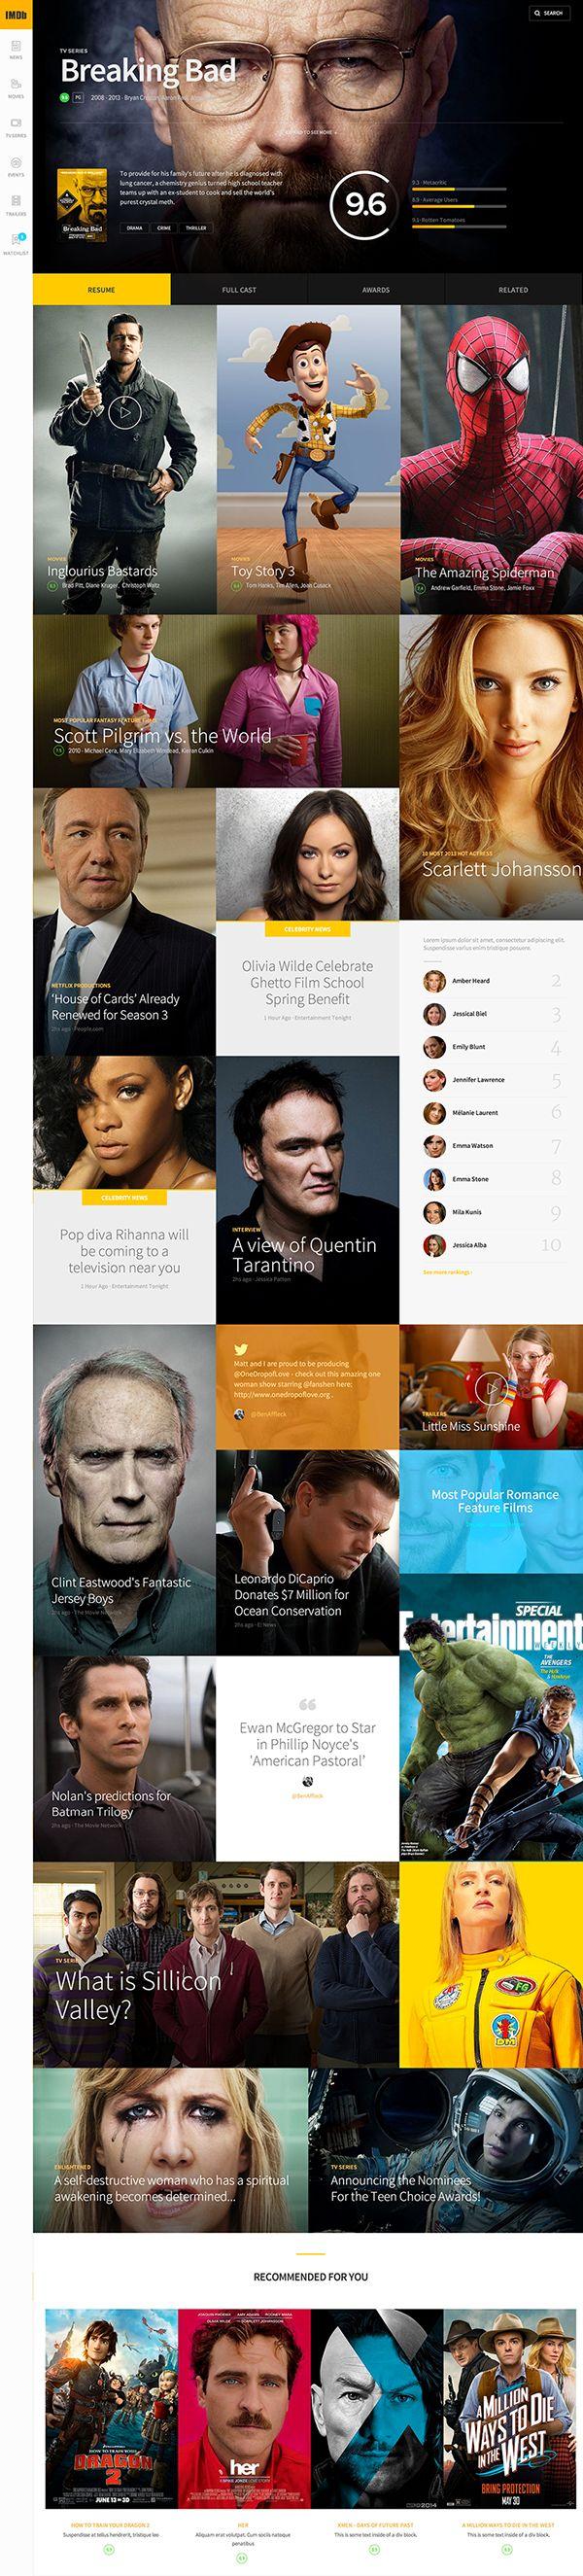 Prototype and new concept design for IMDb | Inspiration DE